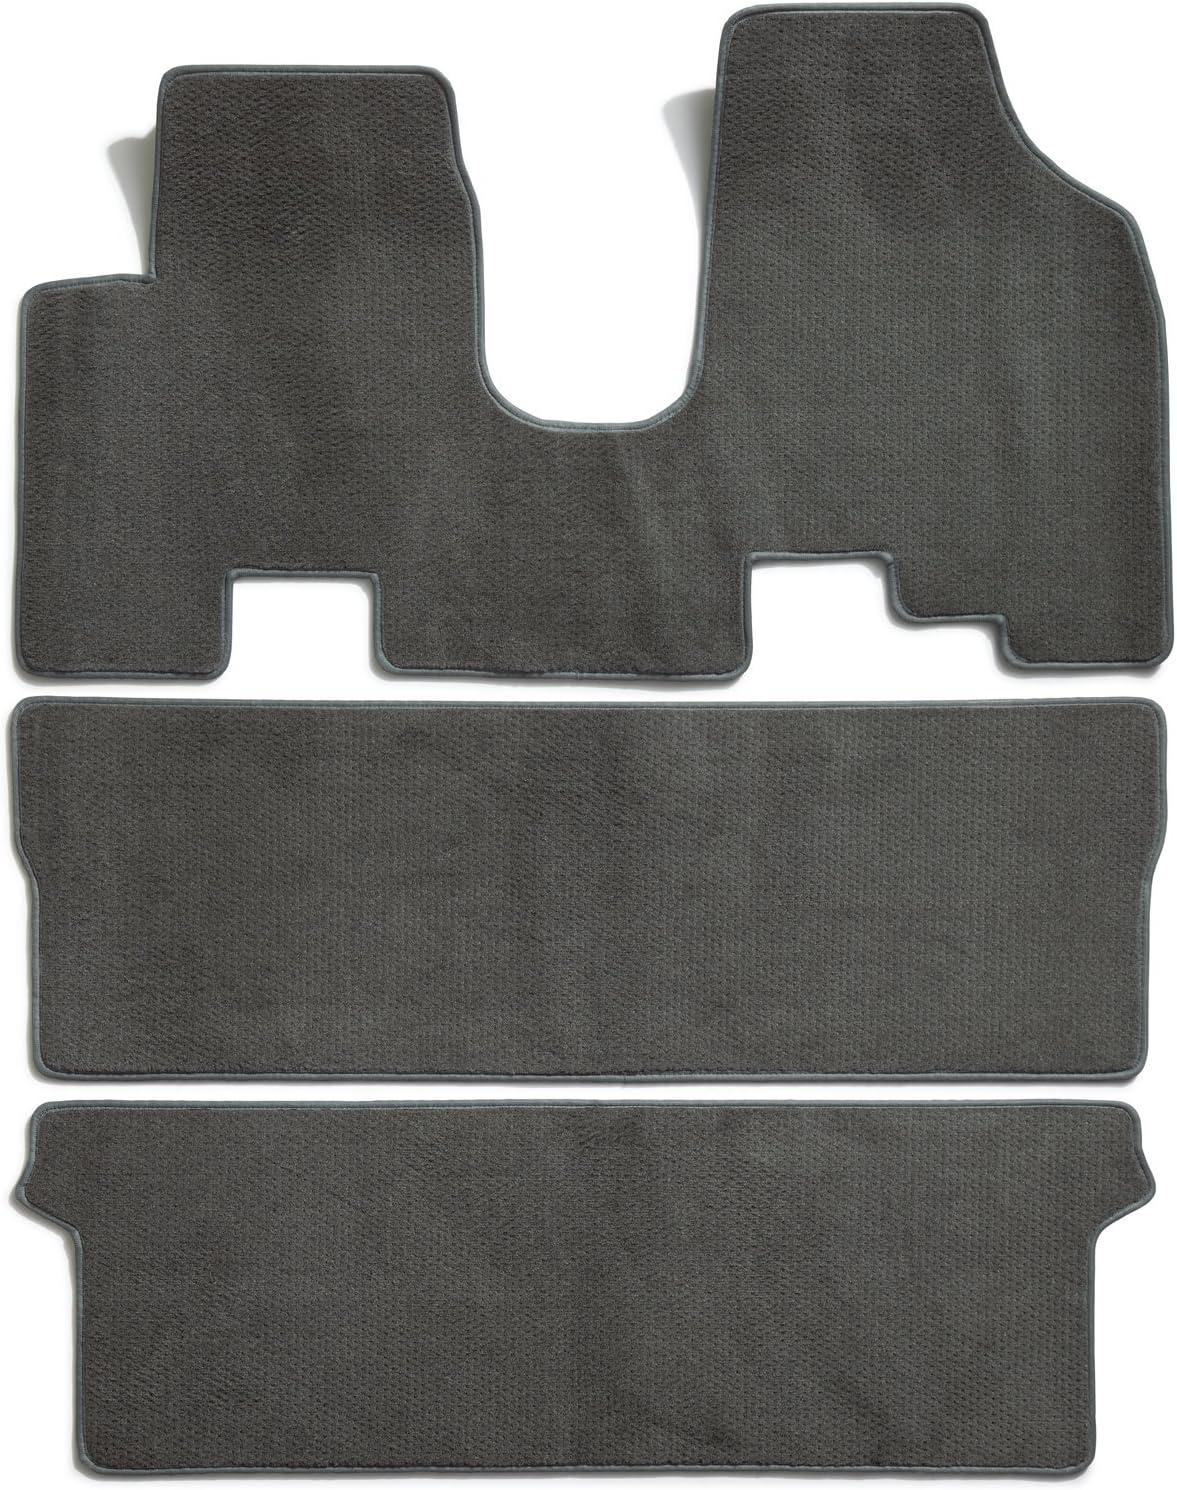 Premier Custom Fit 3-piece Set All One Piece Carpet Floor Mats for Honda Odyssey Premium Nylon, Gray 761977-47